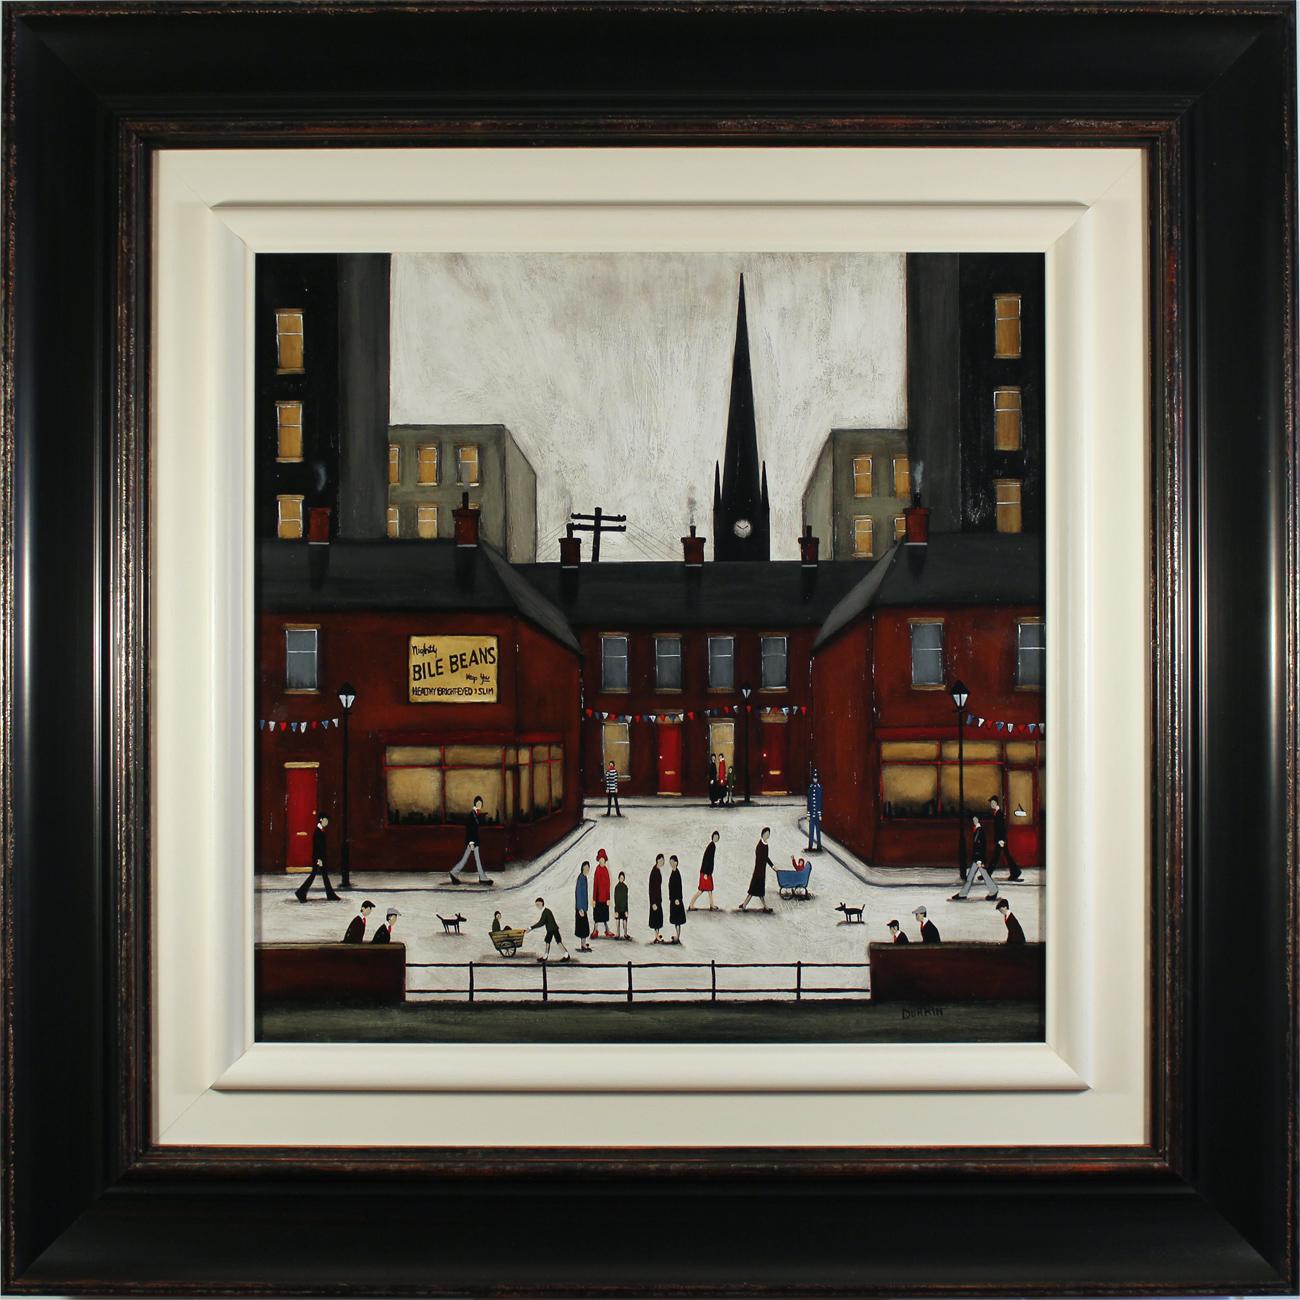 Sean Durkin, Original oil painting on panel, Yorkshire Jubilee Click to enlarge